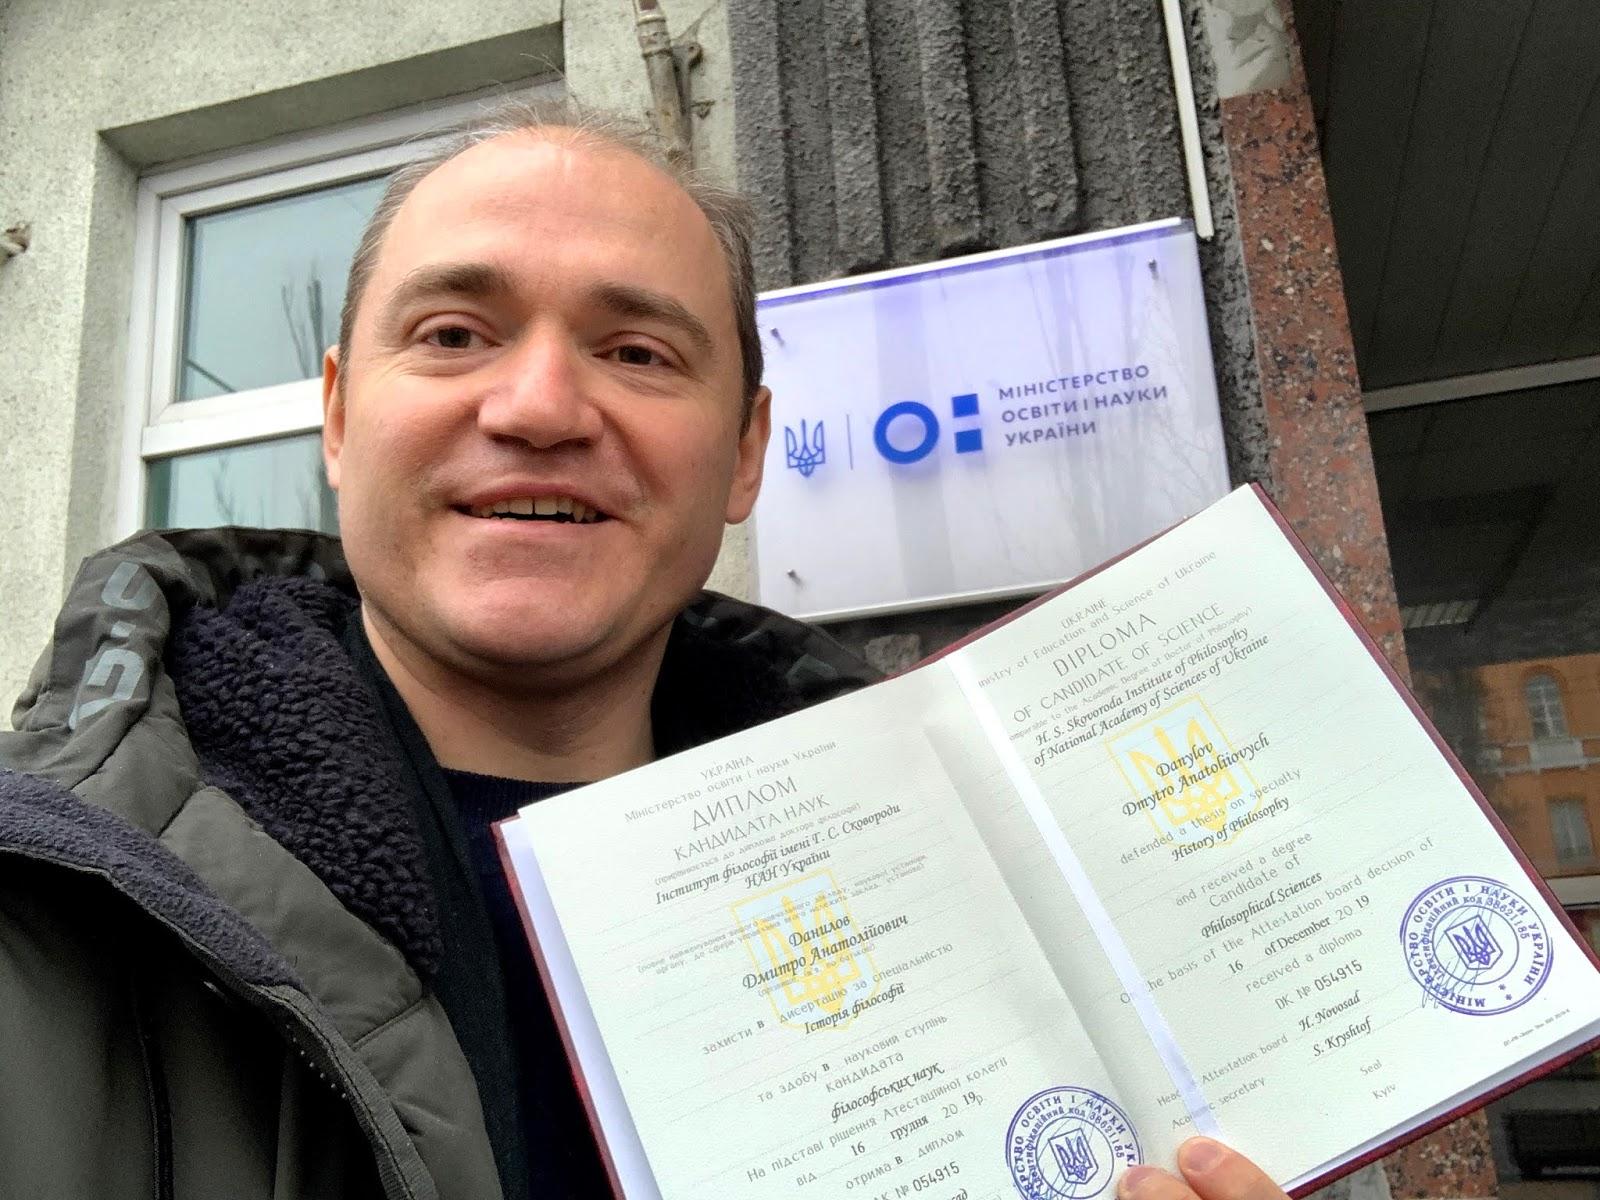 Dmytro Danylov yoga phd Ukraine thesis phylosophy йога Дмитрий Данилов диссертация философия дхьяна dhyana